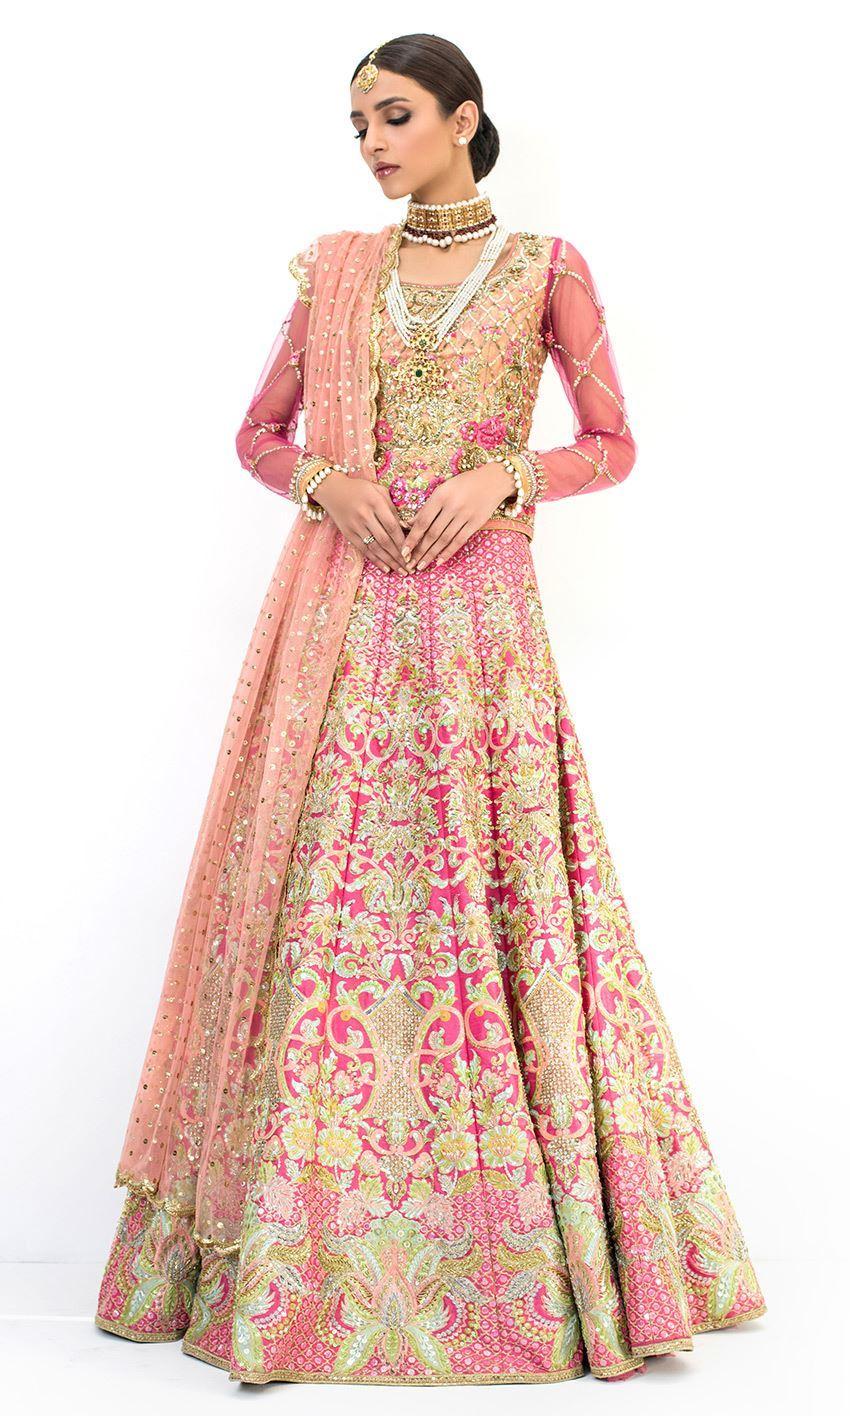 Nomi Ansari Bridal